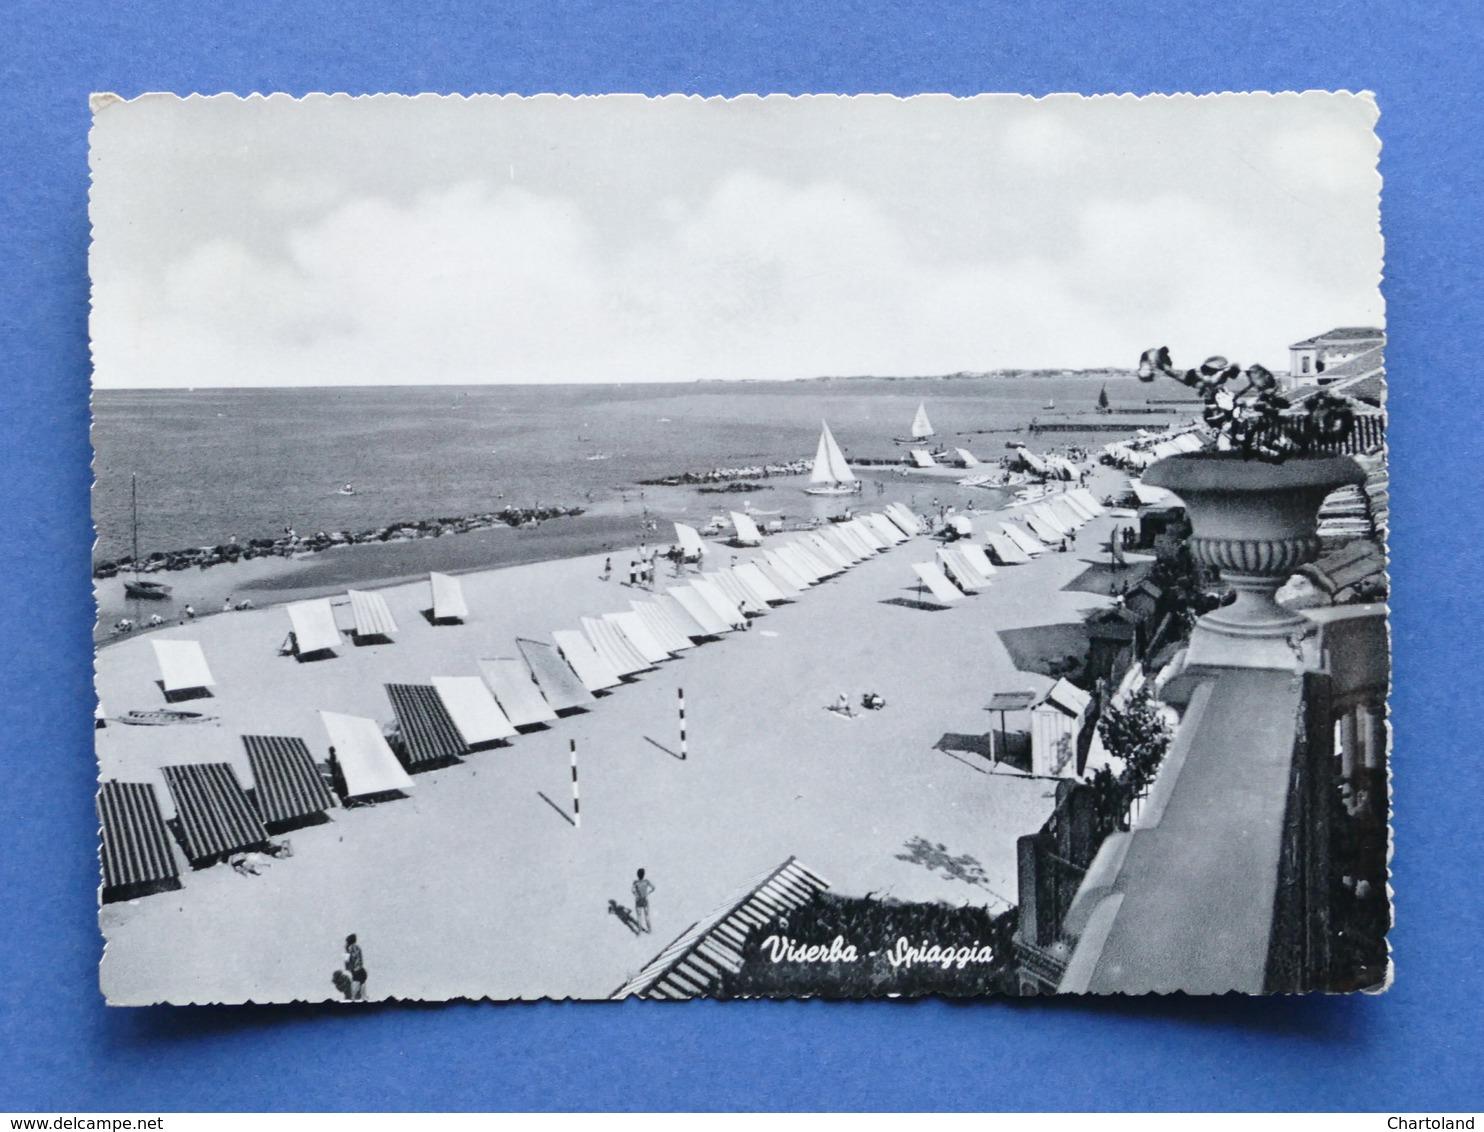 Cartolina Viserba - Spiaggia - 1954 - Rimini